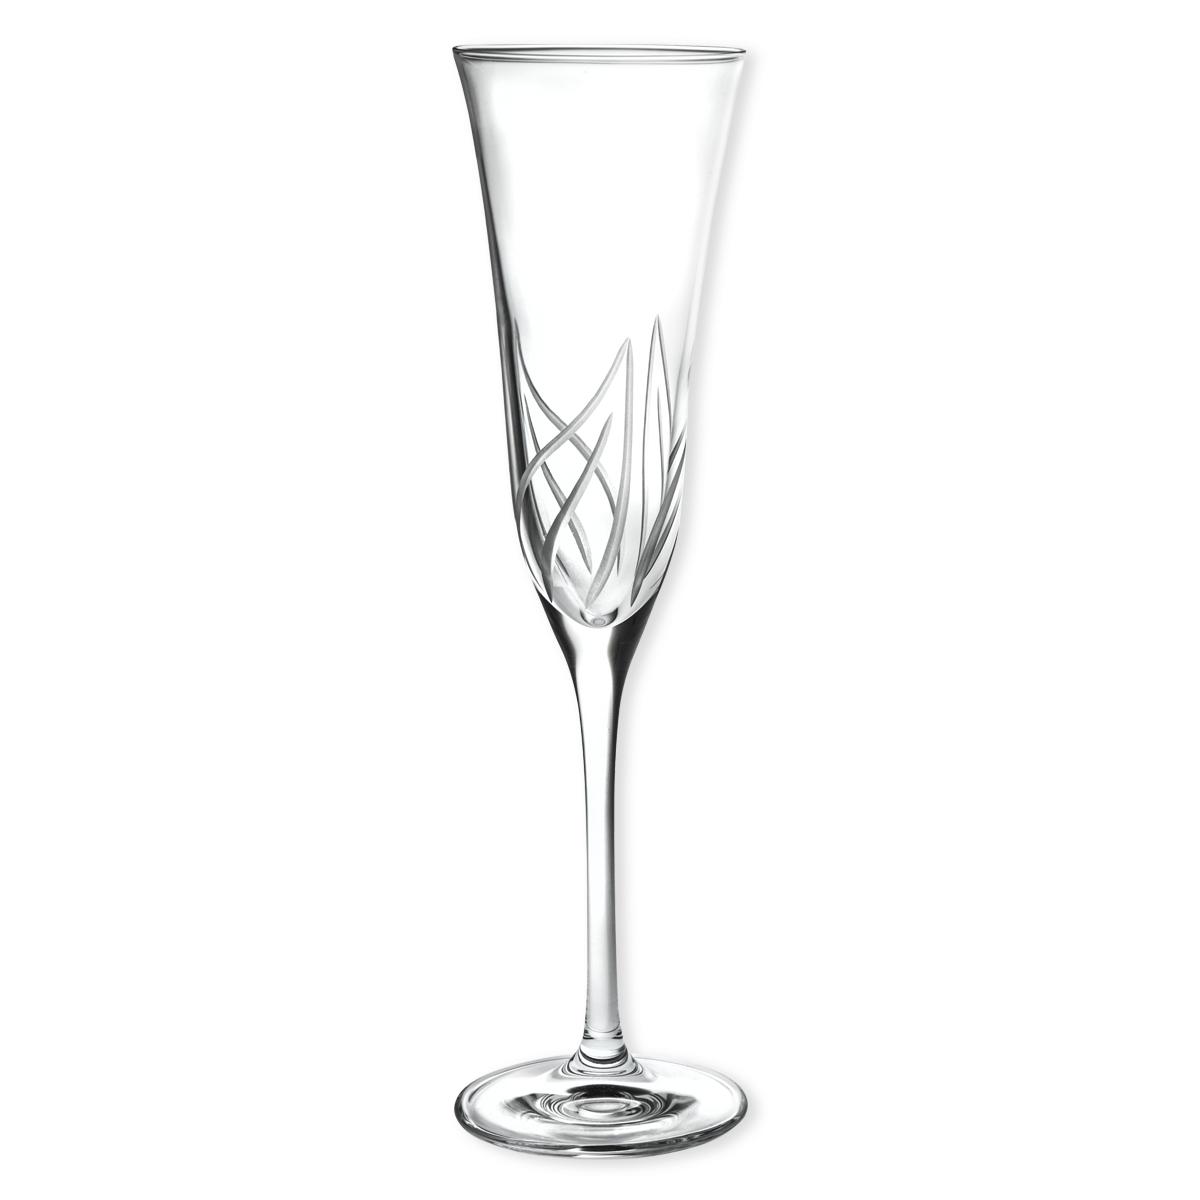 fl te champagne verre luxion 17cl verrerie chic bruno evrard. Black Bedroom Furniture Sets. Home Design Ideas